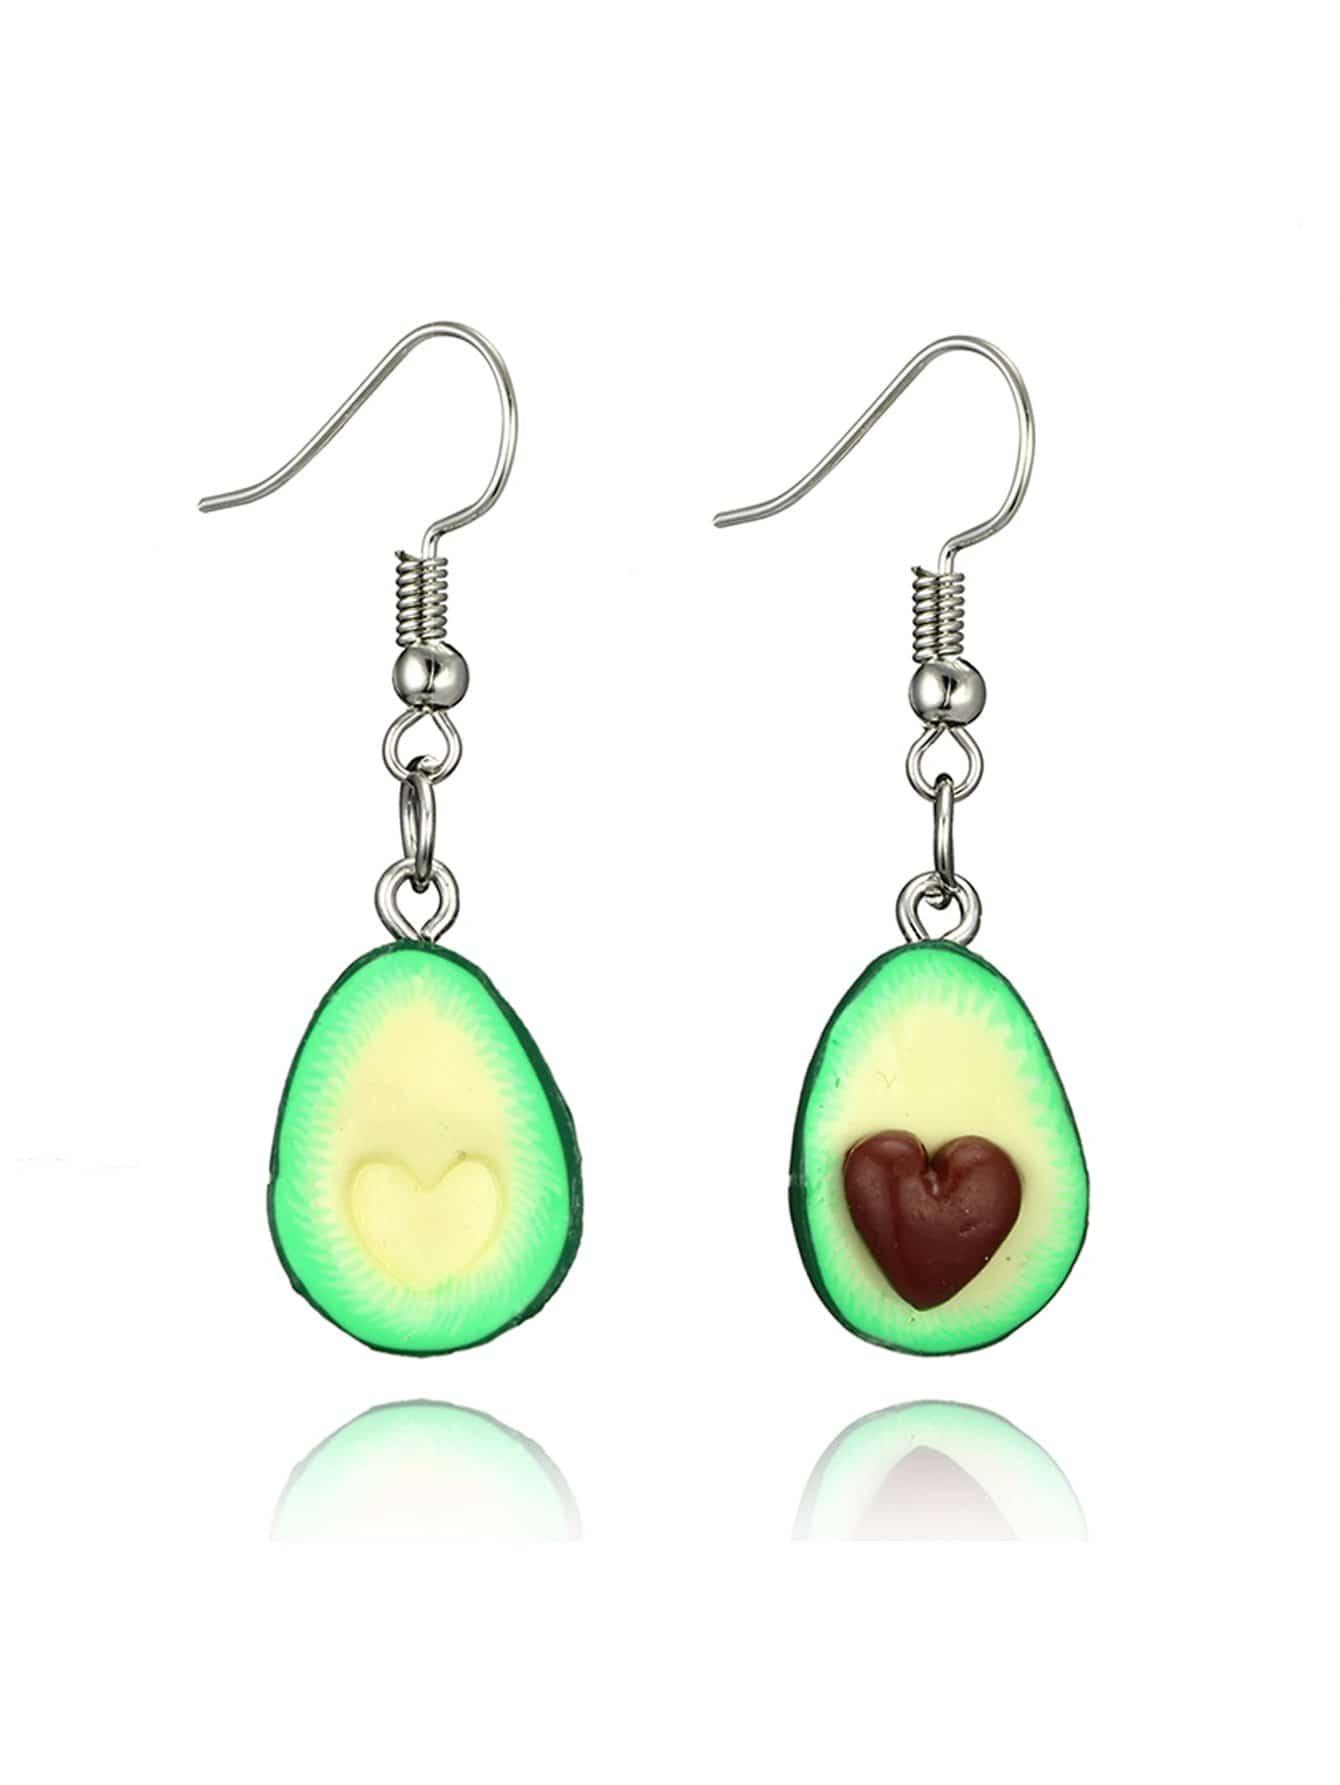 Avocado Design Drop Earrings two tone face design drop earrings